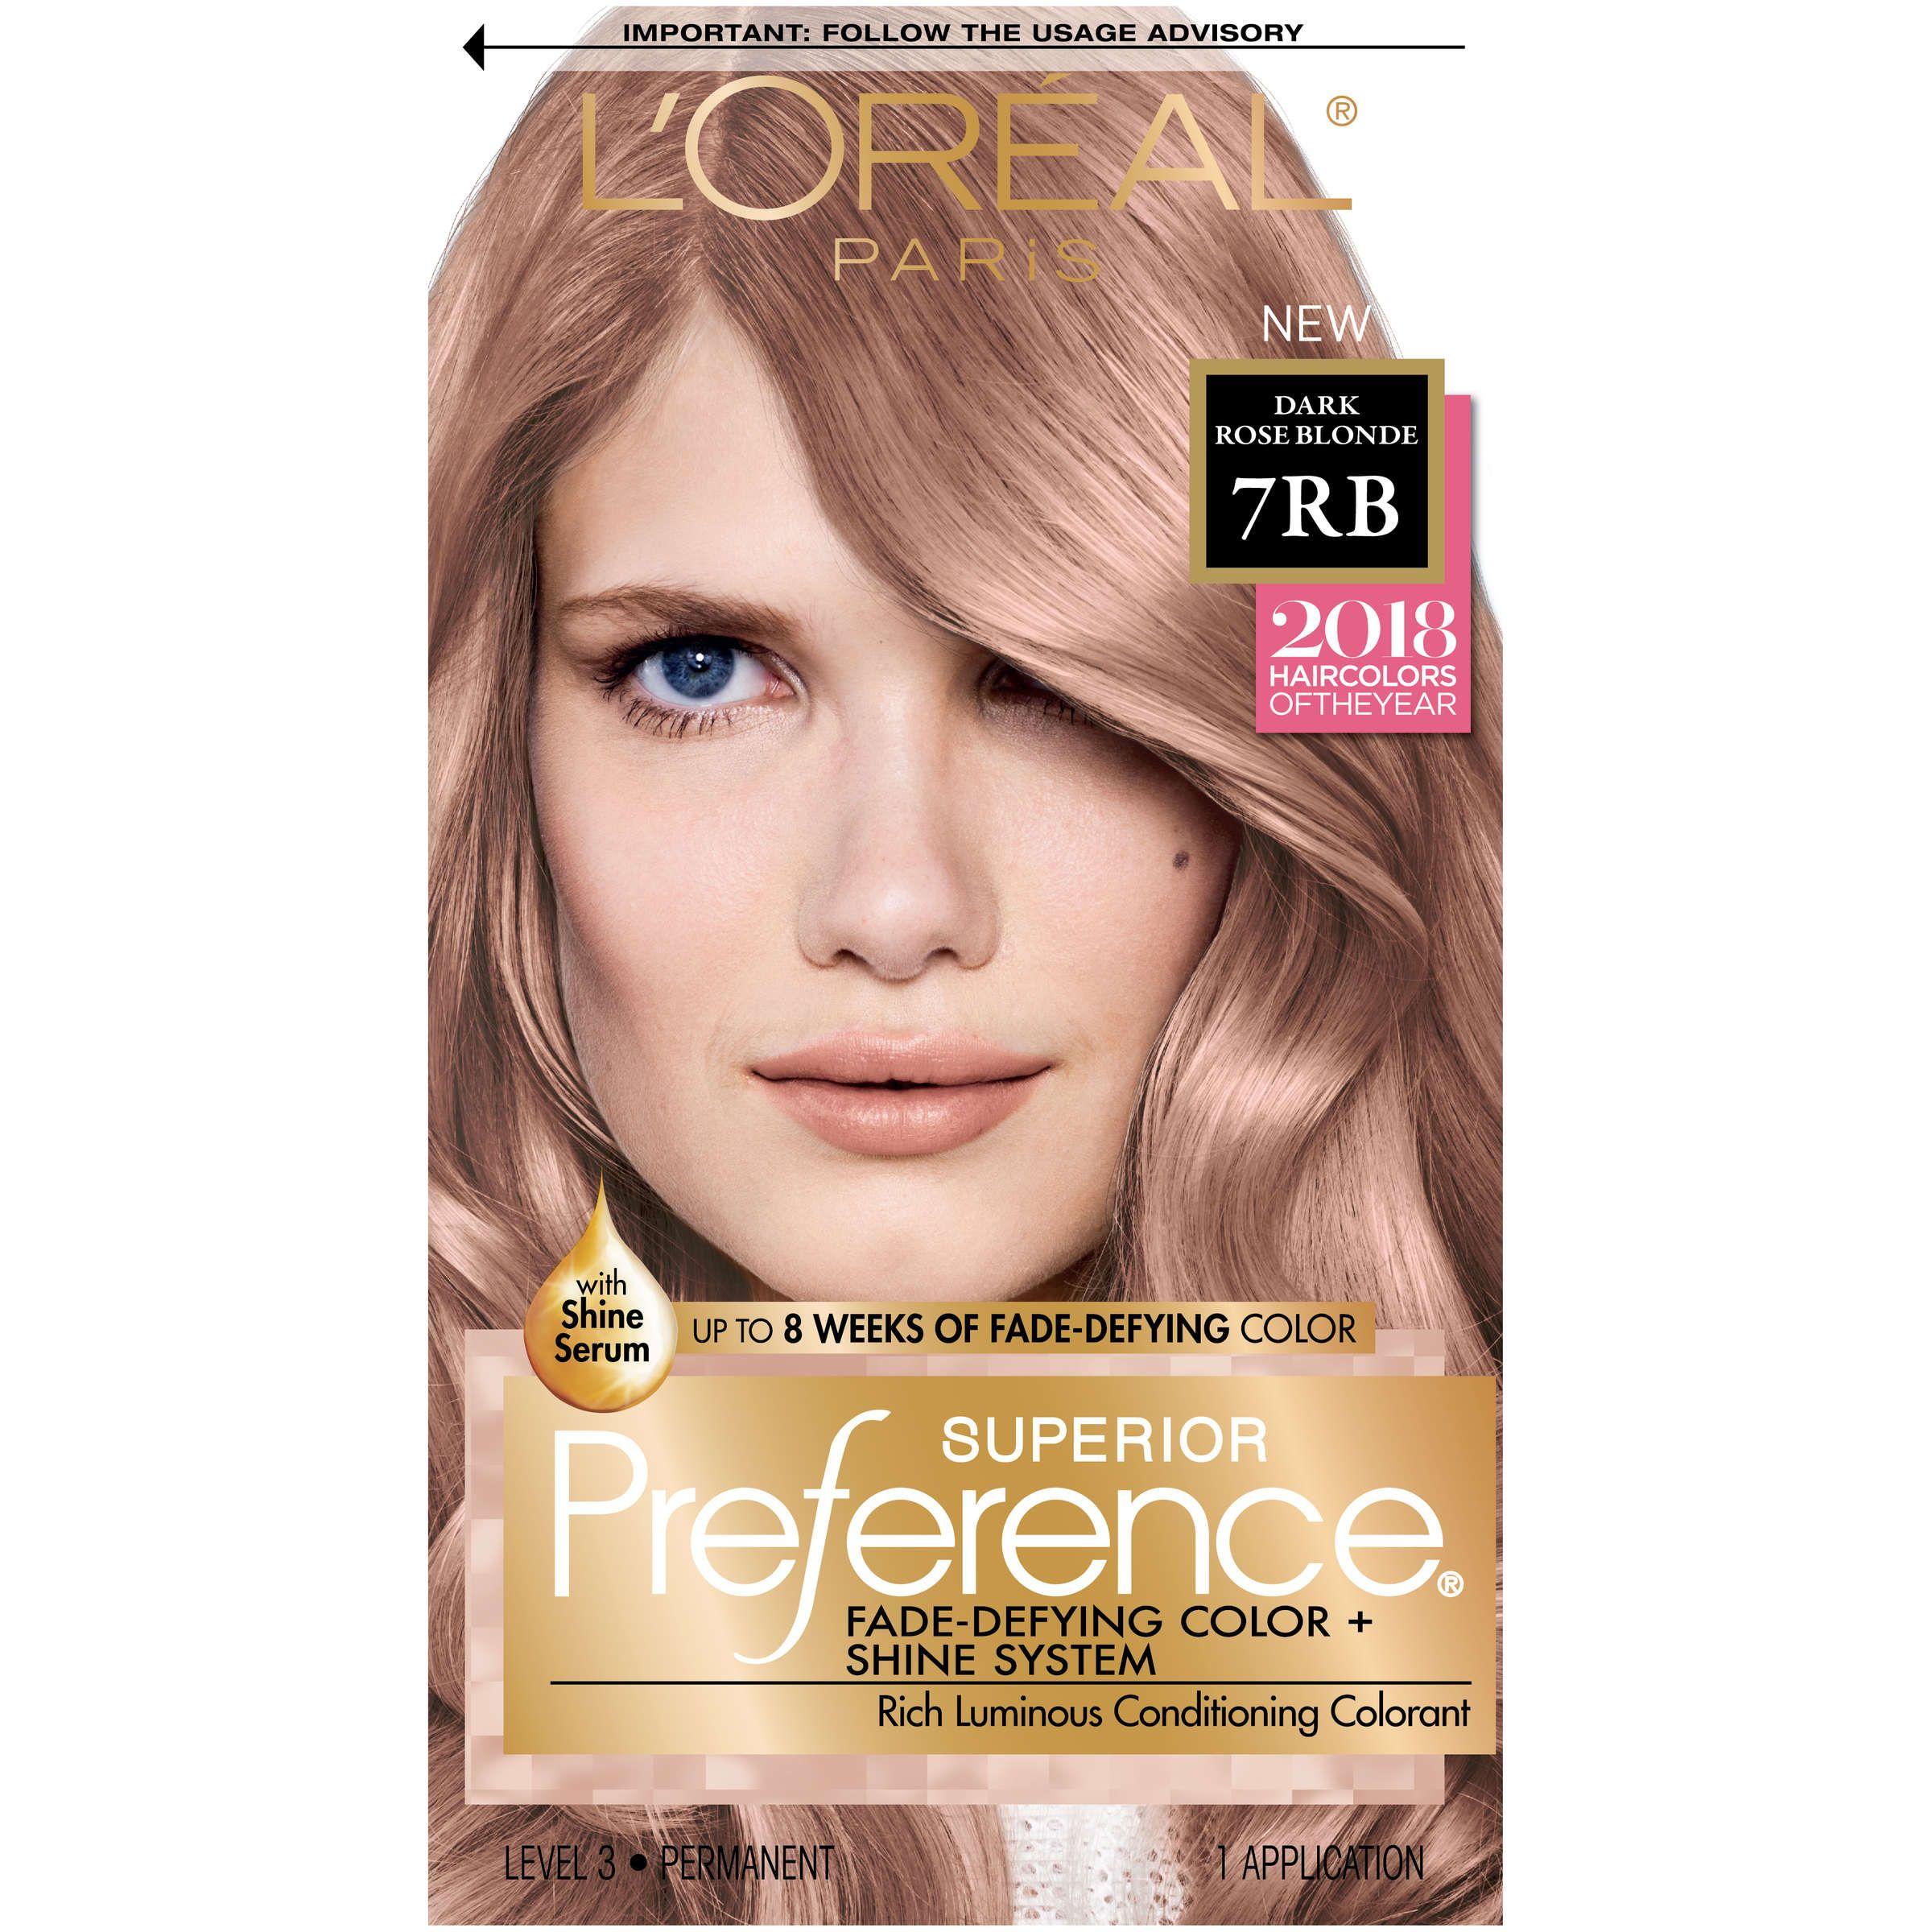 L Oreal Paris Superior Preference Permanent Hair Color 7rb Dark Rose Blonde 1 Kit Walmart Com Rose Blonde Permanent Hair Color Hair Color